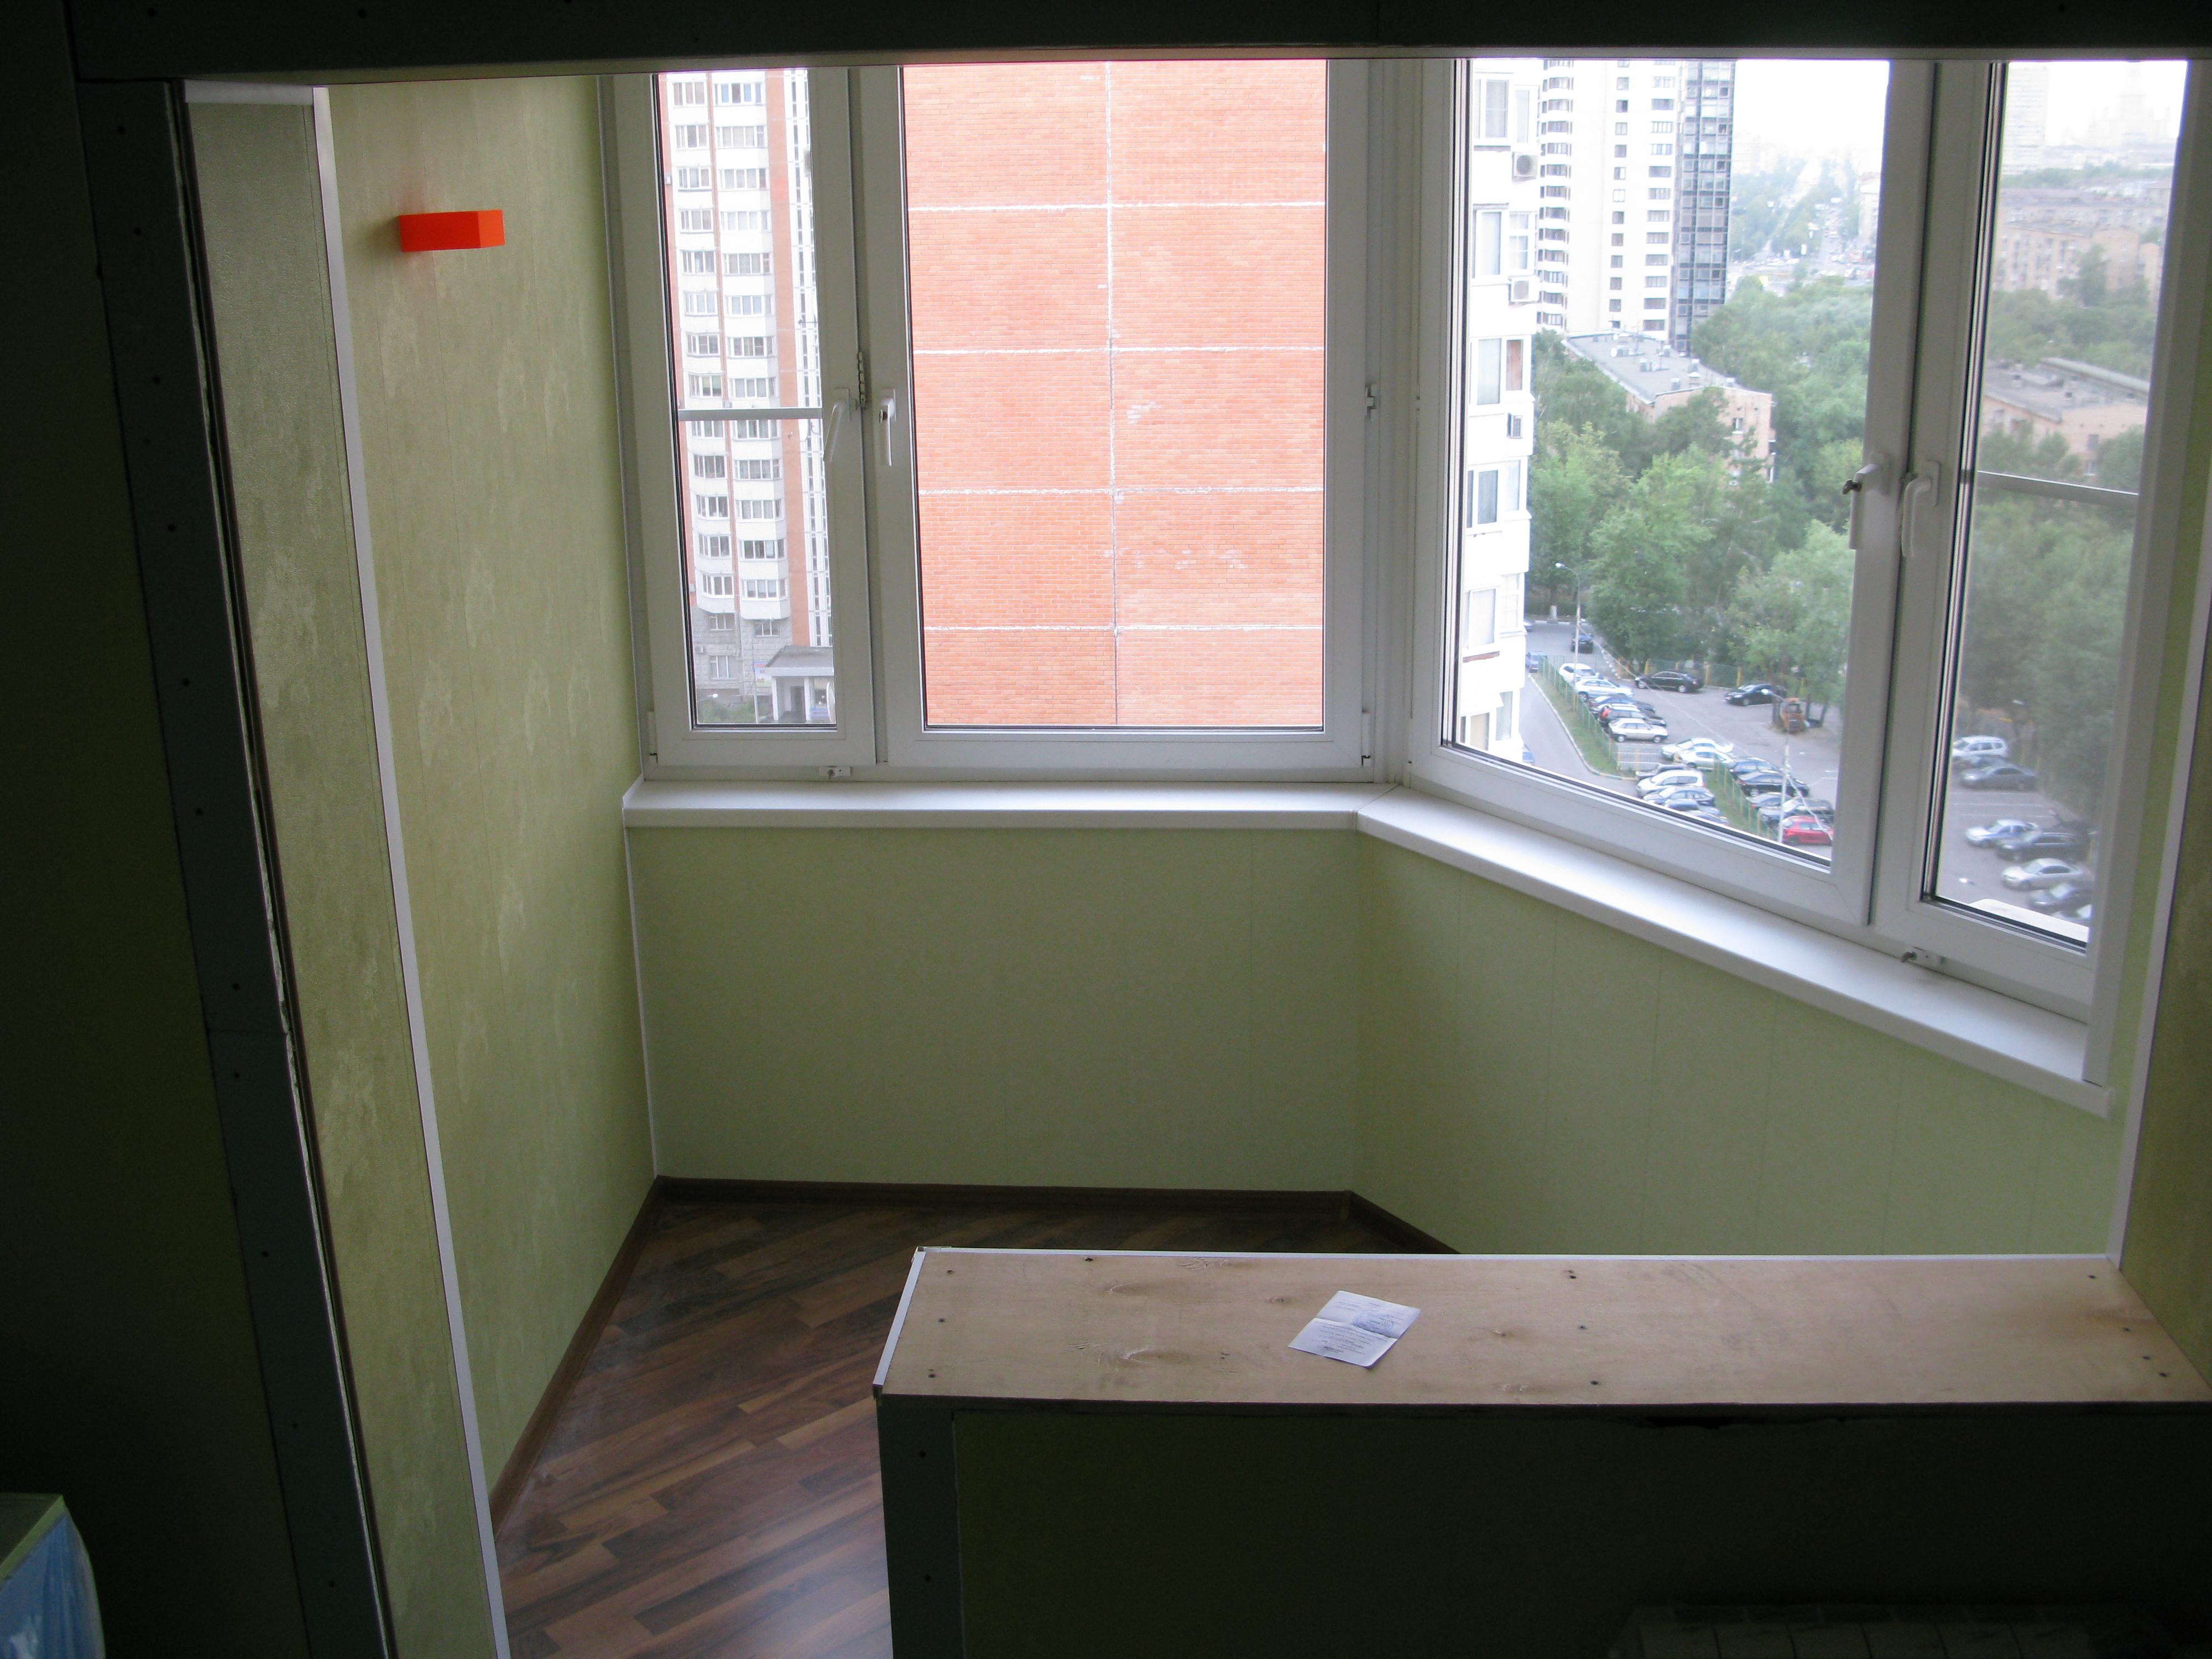 Объединение лоджии балкона с комнатой.